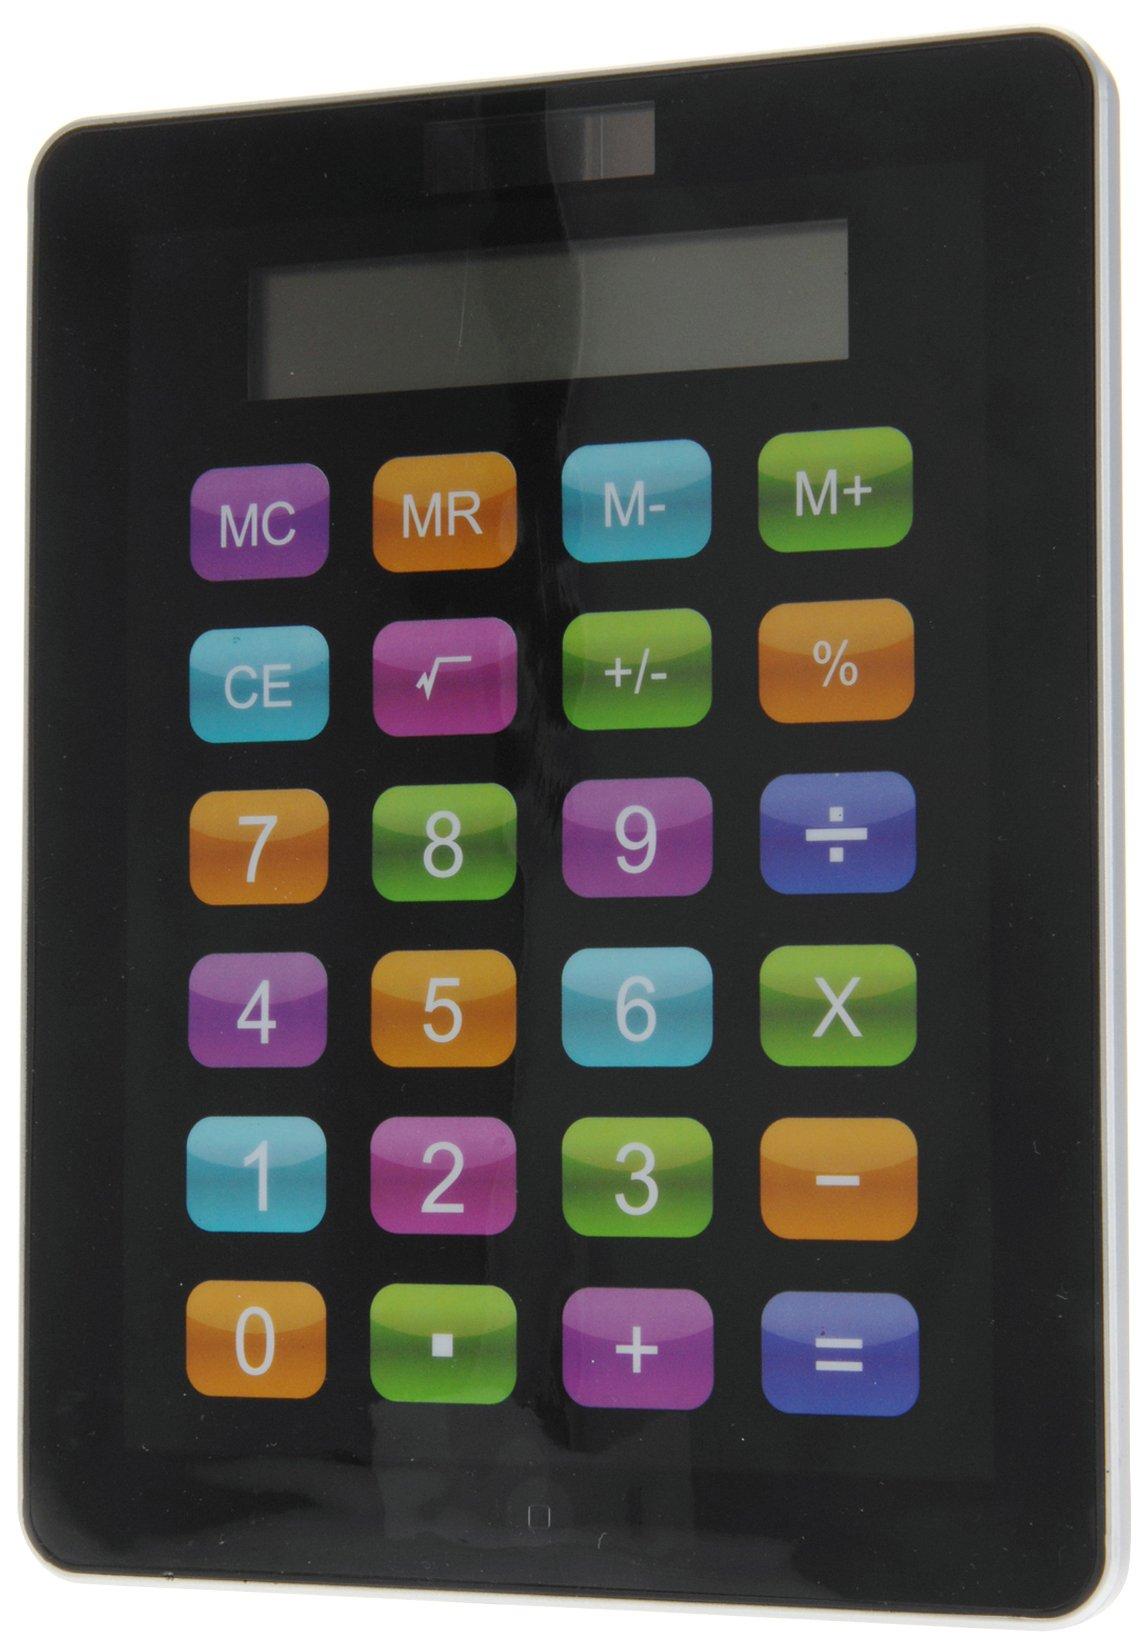 Bbtradesales Giant App Solar Calculator by Bbtradesales